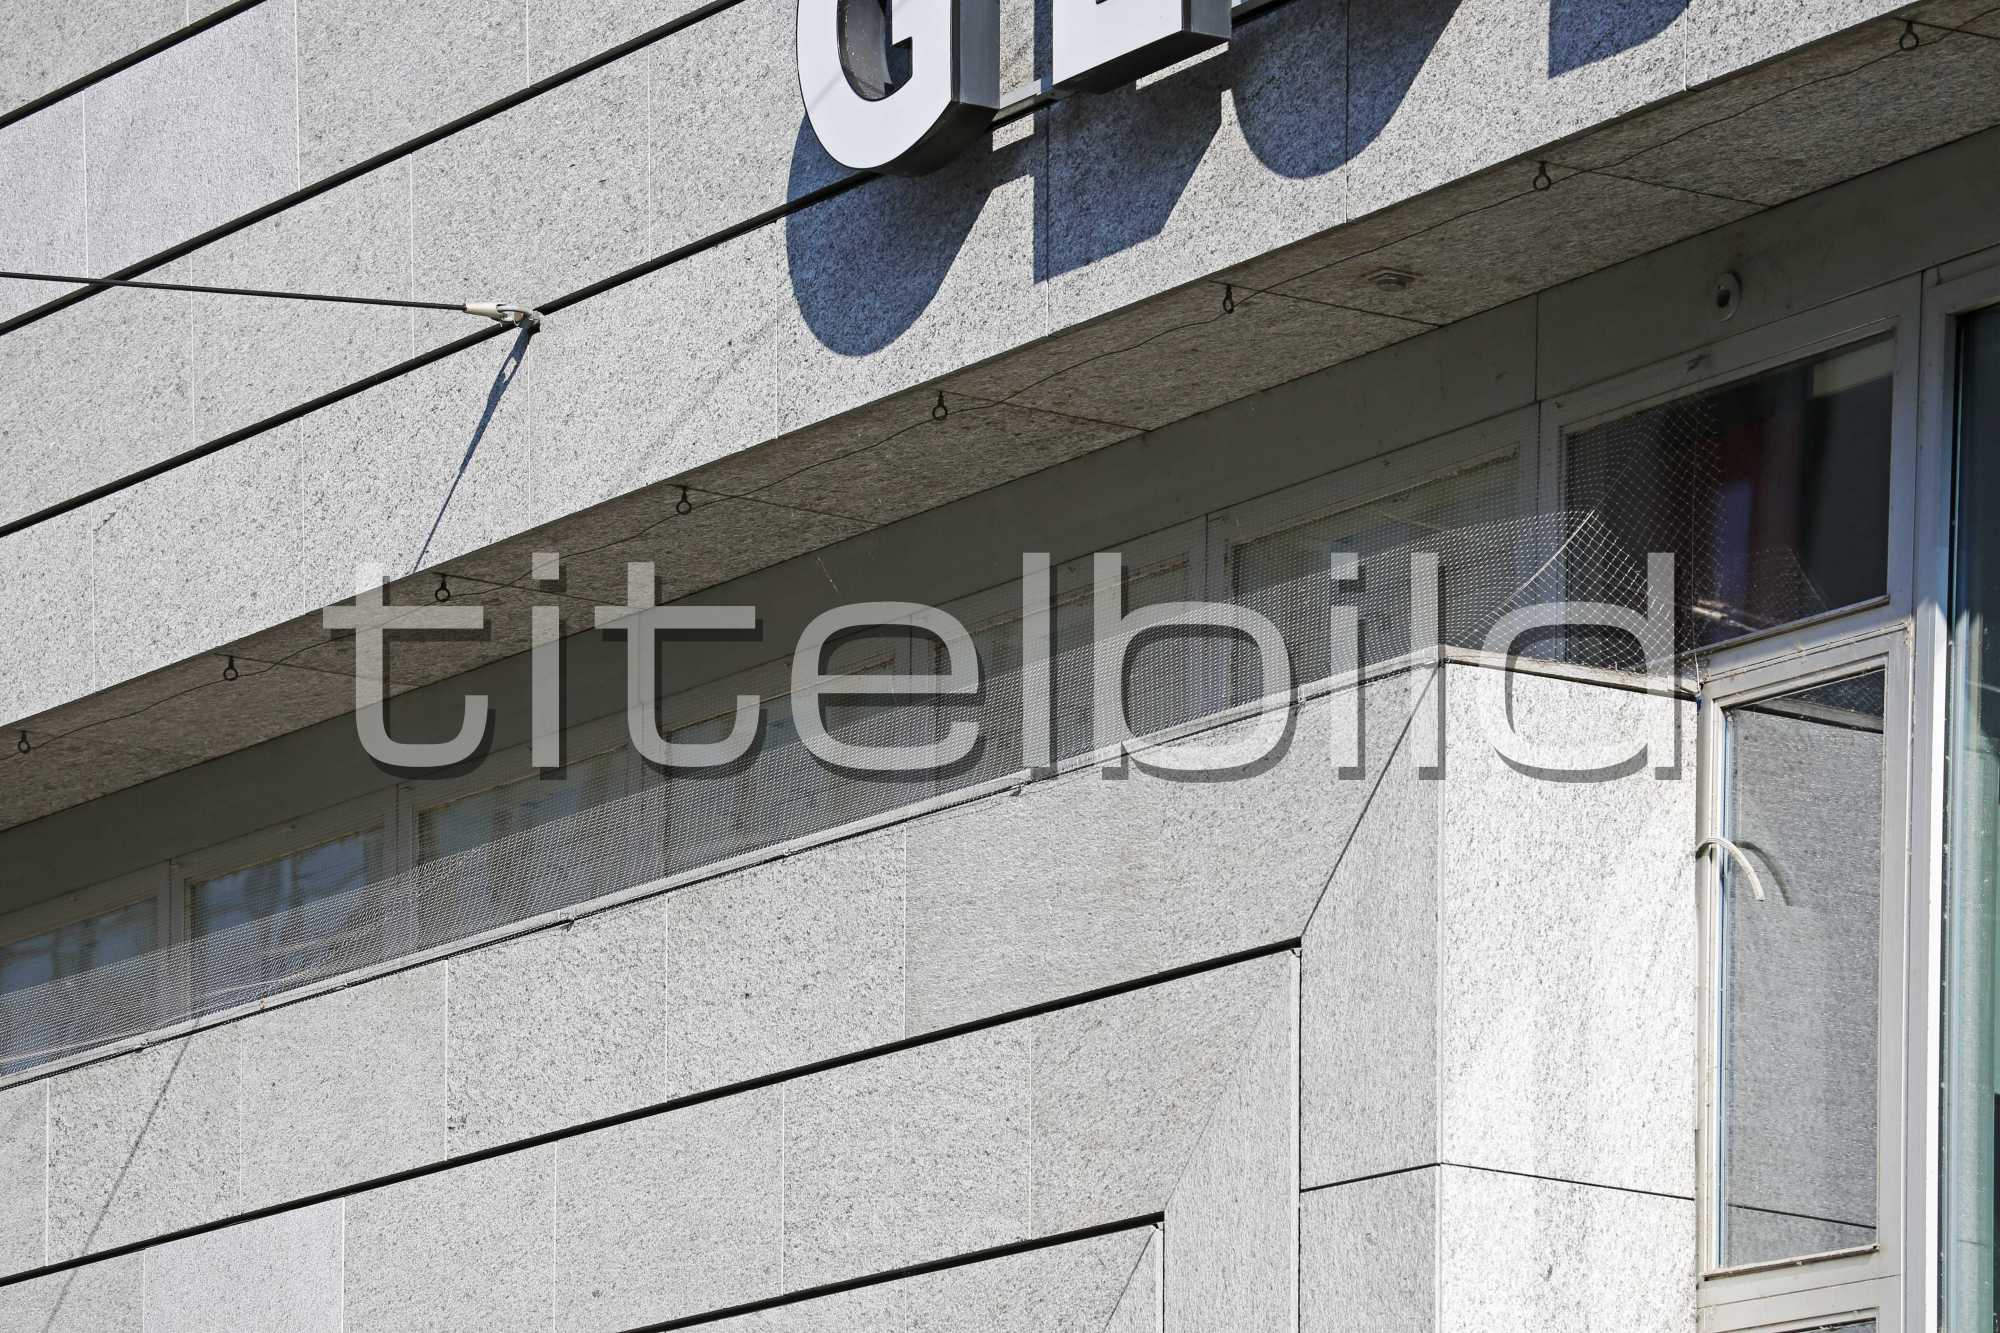 Projektbild-Nr. 4: Globus Zürich Bahnhofstrasse